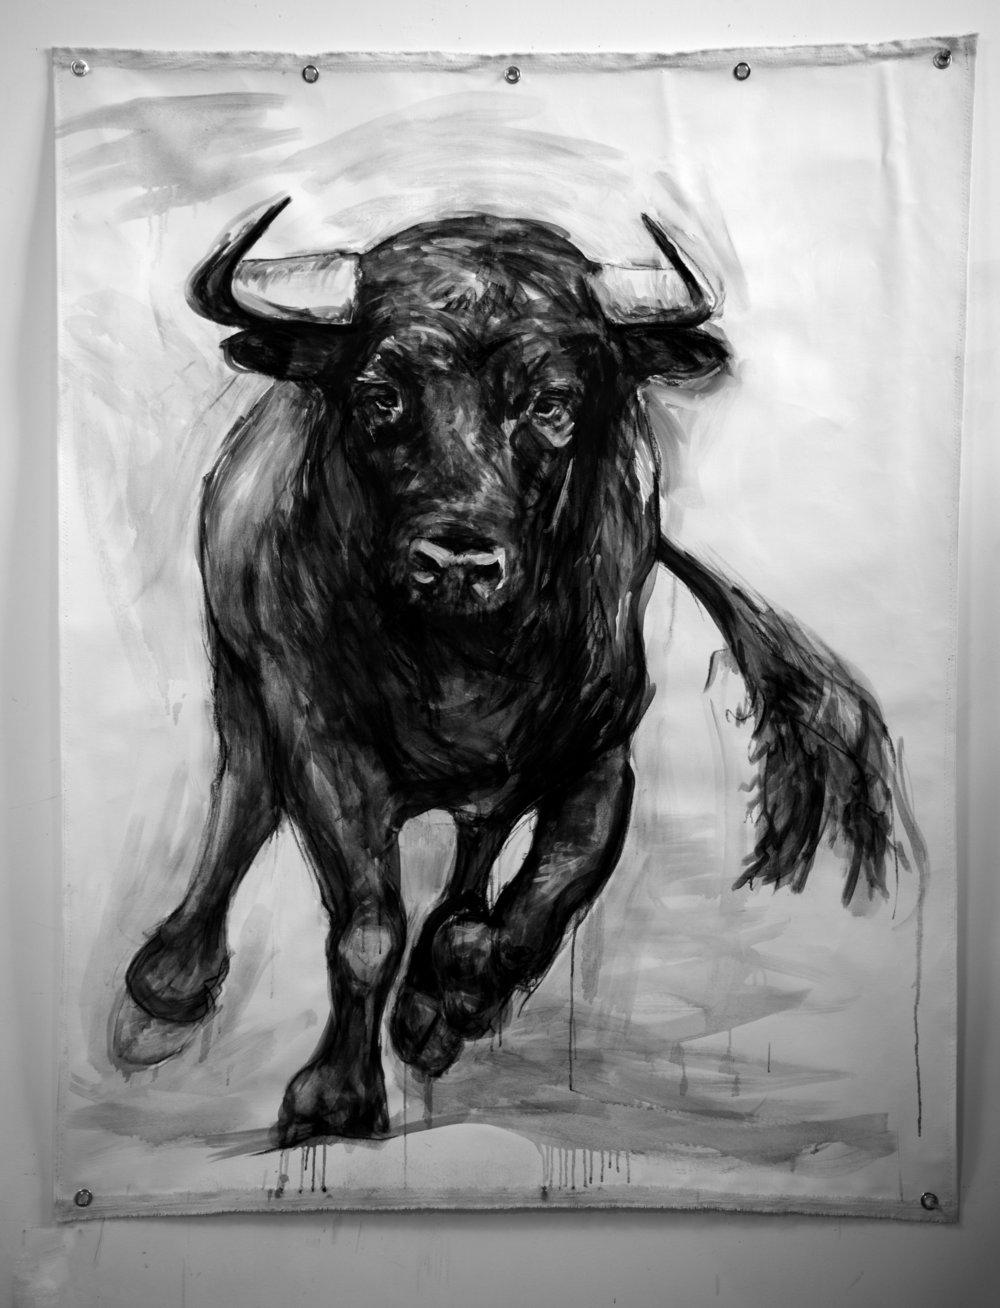 Bull No. 2